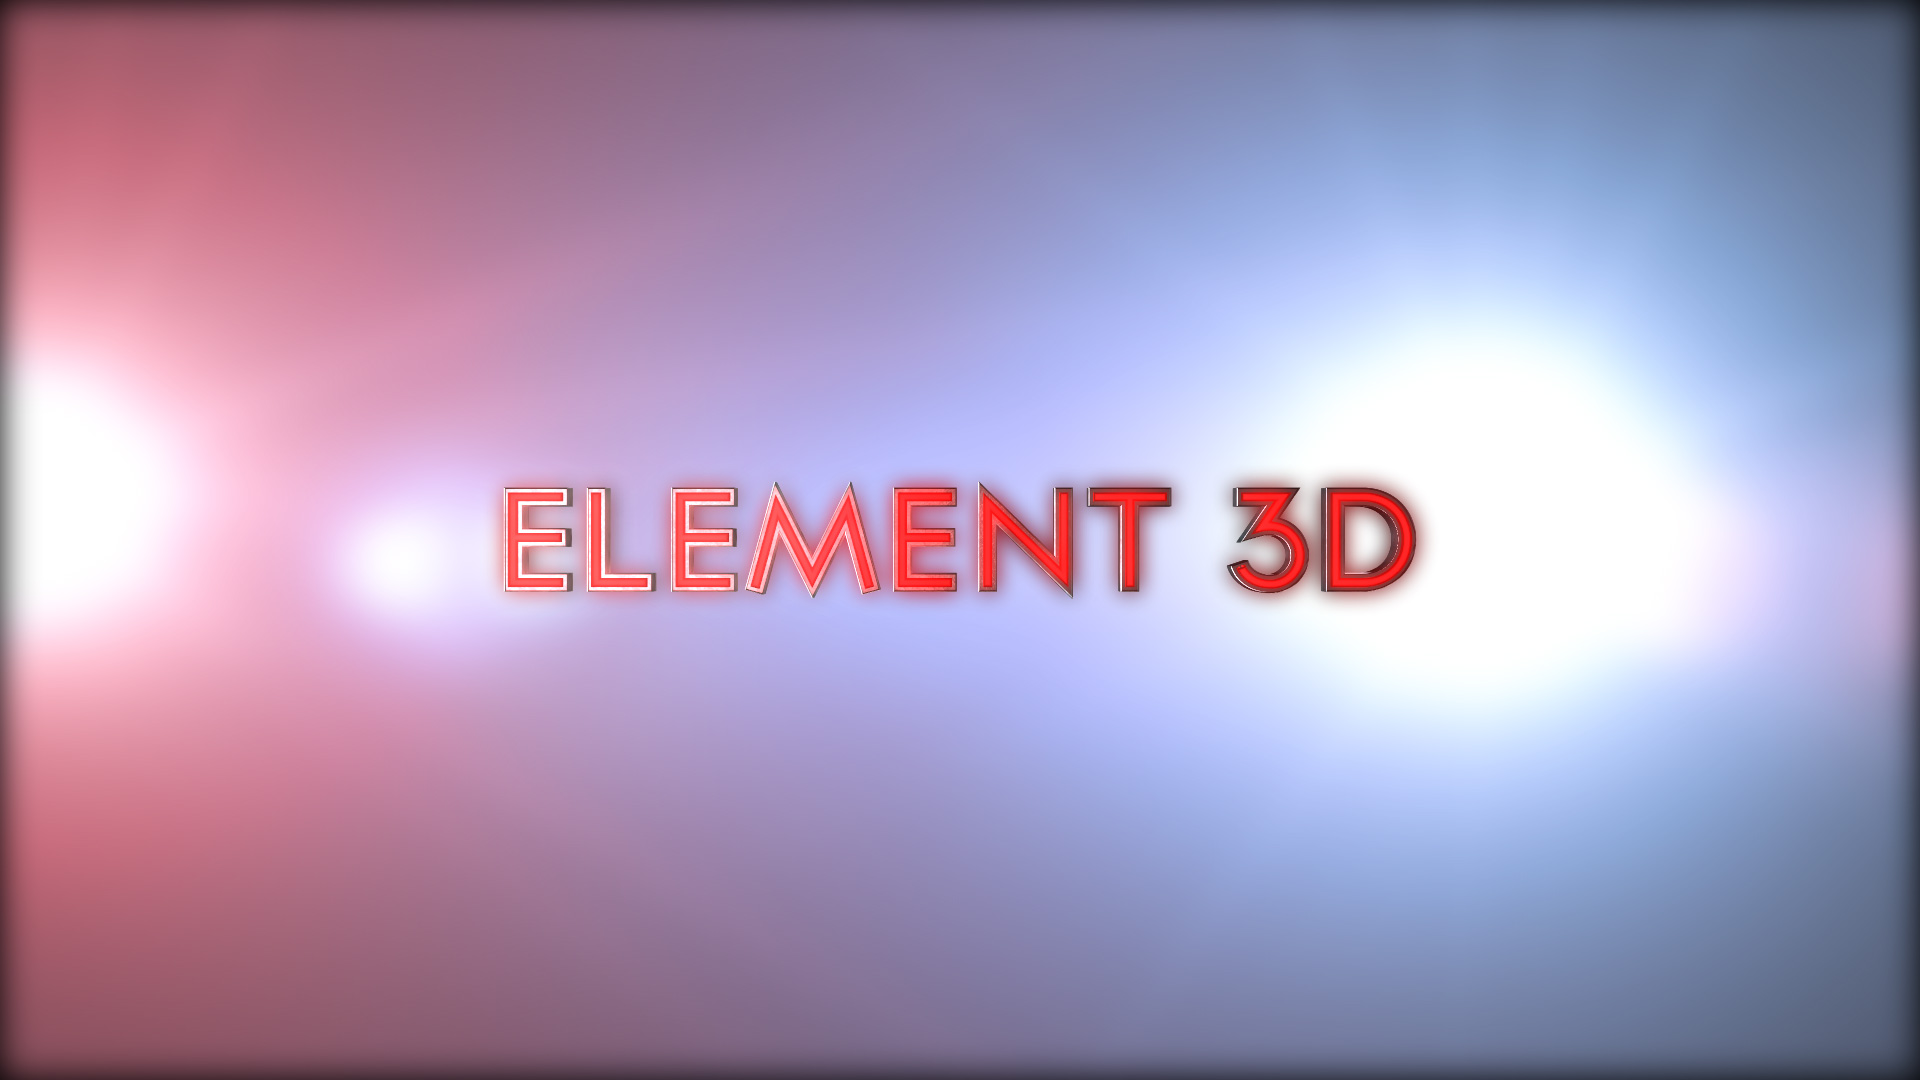 3D TEXT intro